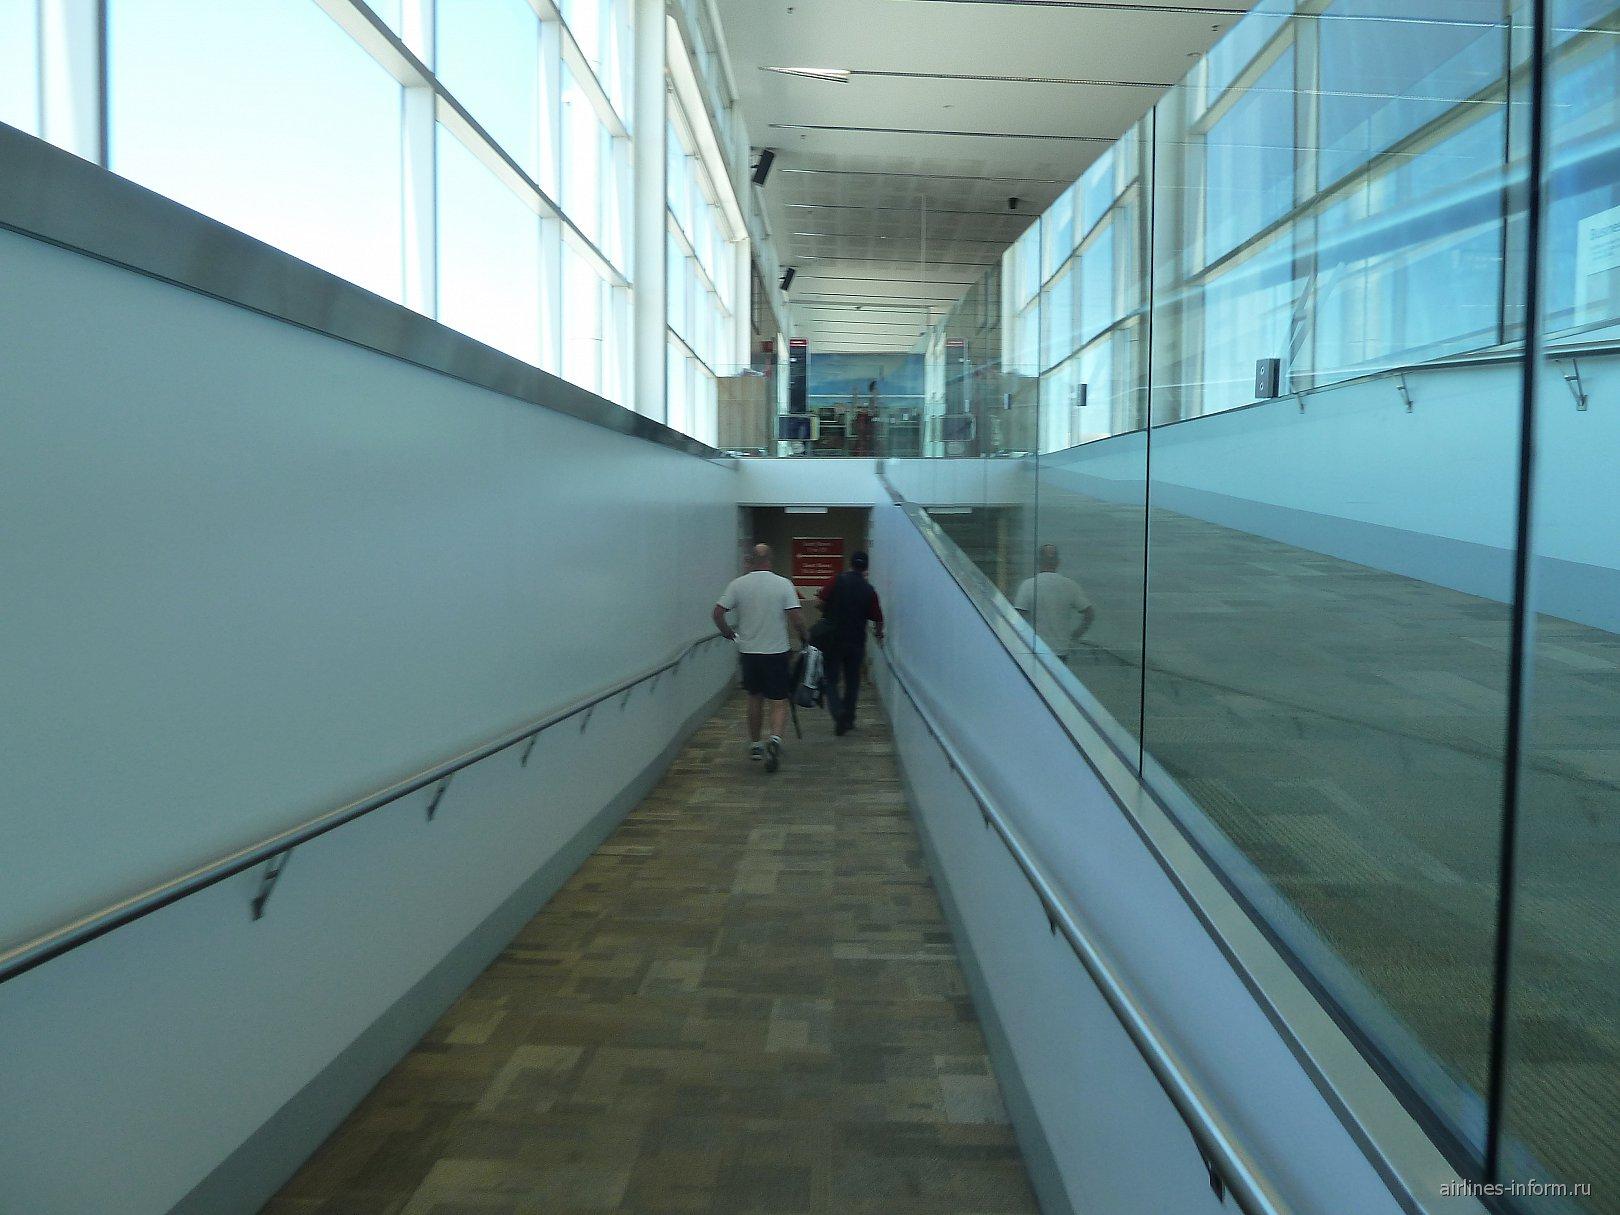 Посадка на рейс авиакомпании JetStar в аэропорту Аделаида